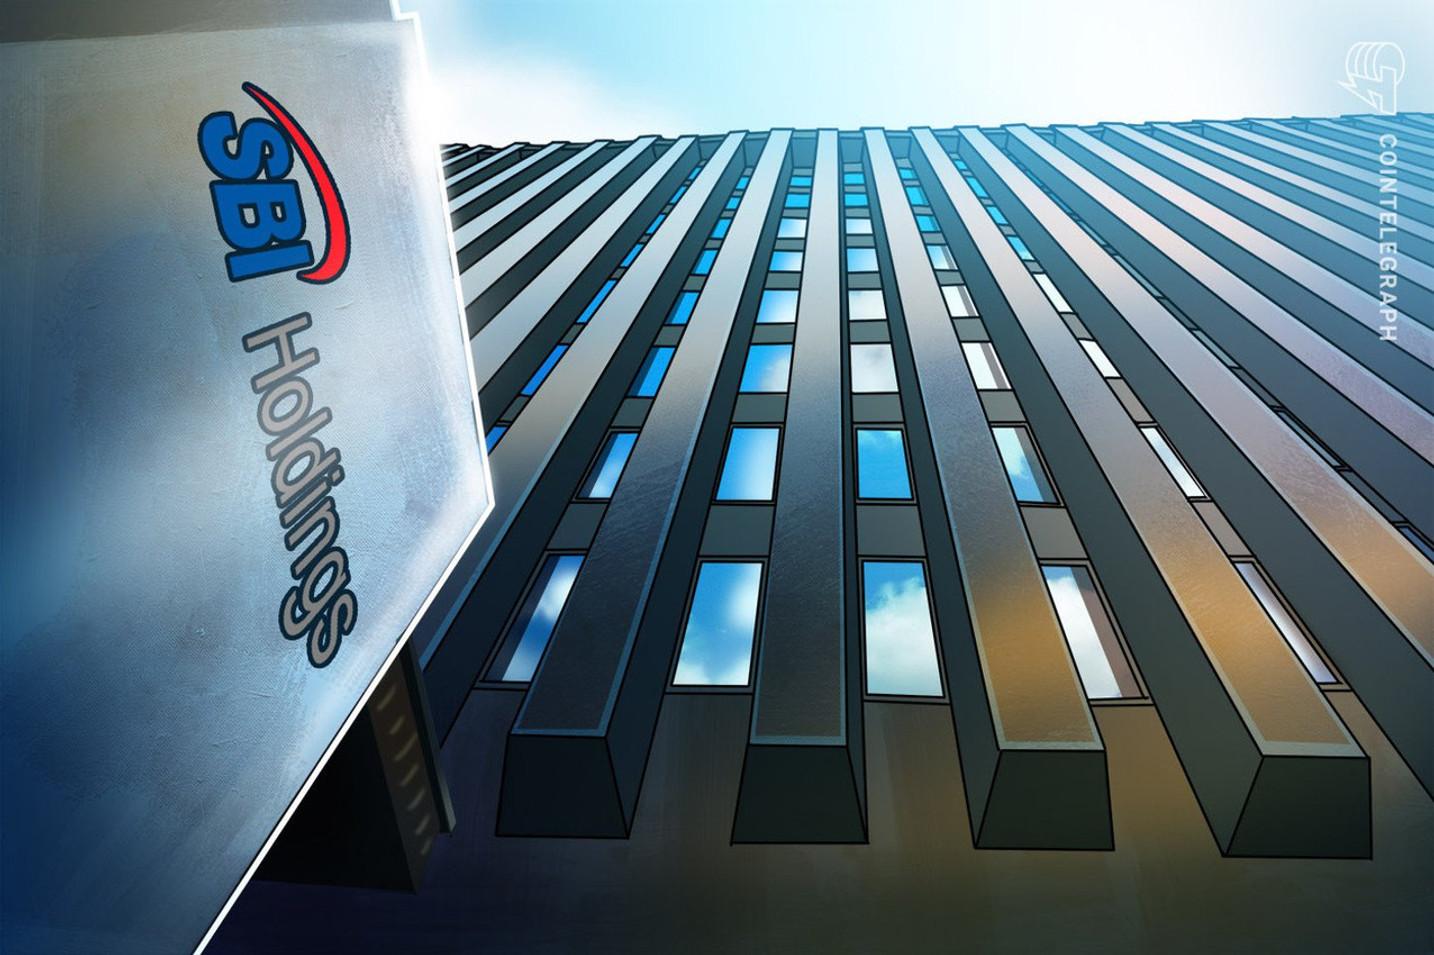 SBIの仮想通貨関連事業、4~6月の税引前利益は56.3%増の45億円に   NFTやDeFiのサービスも検討中